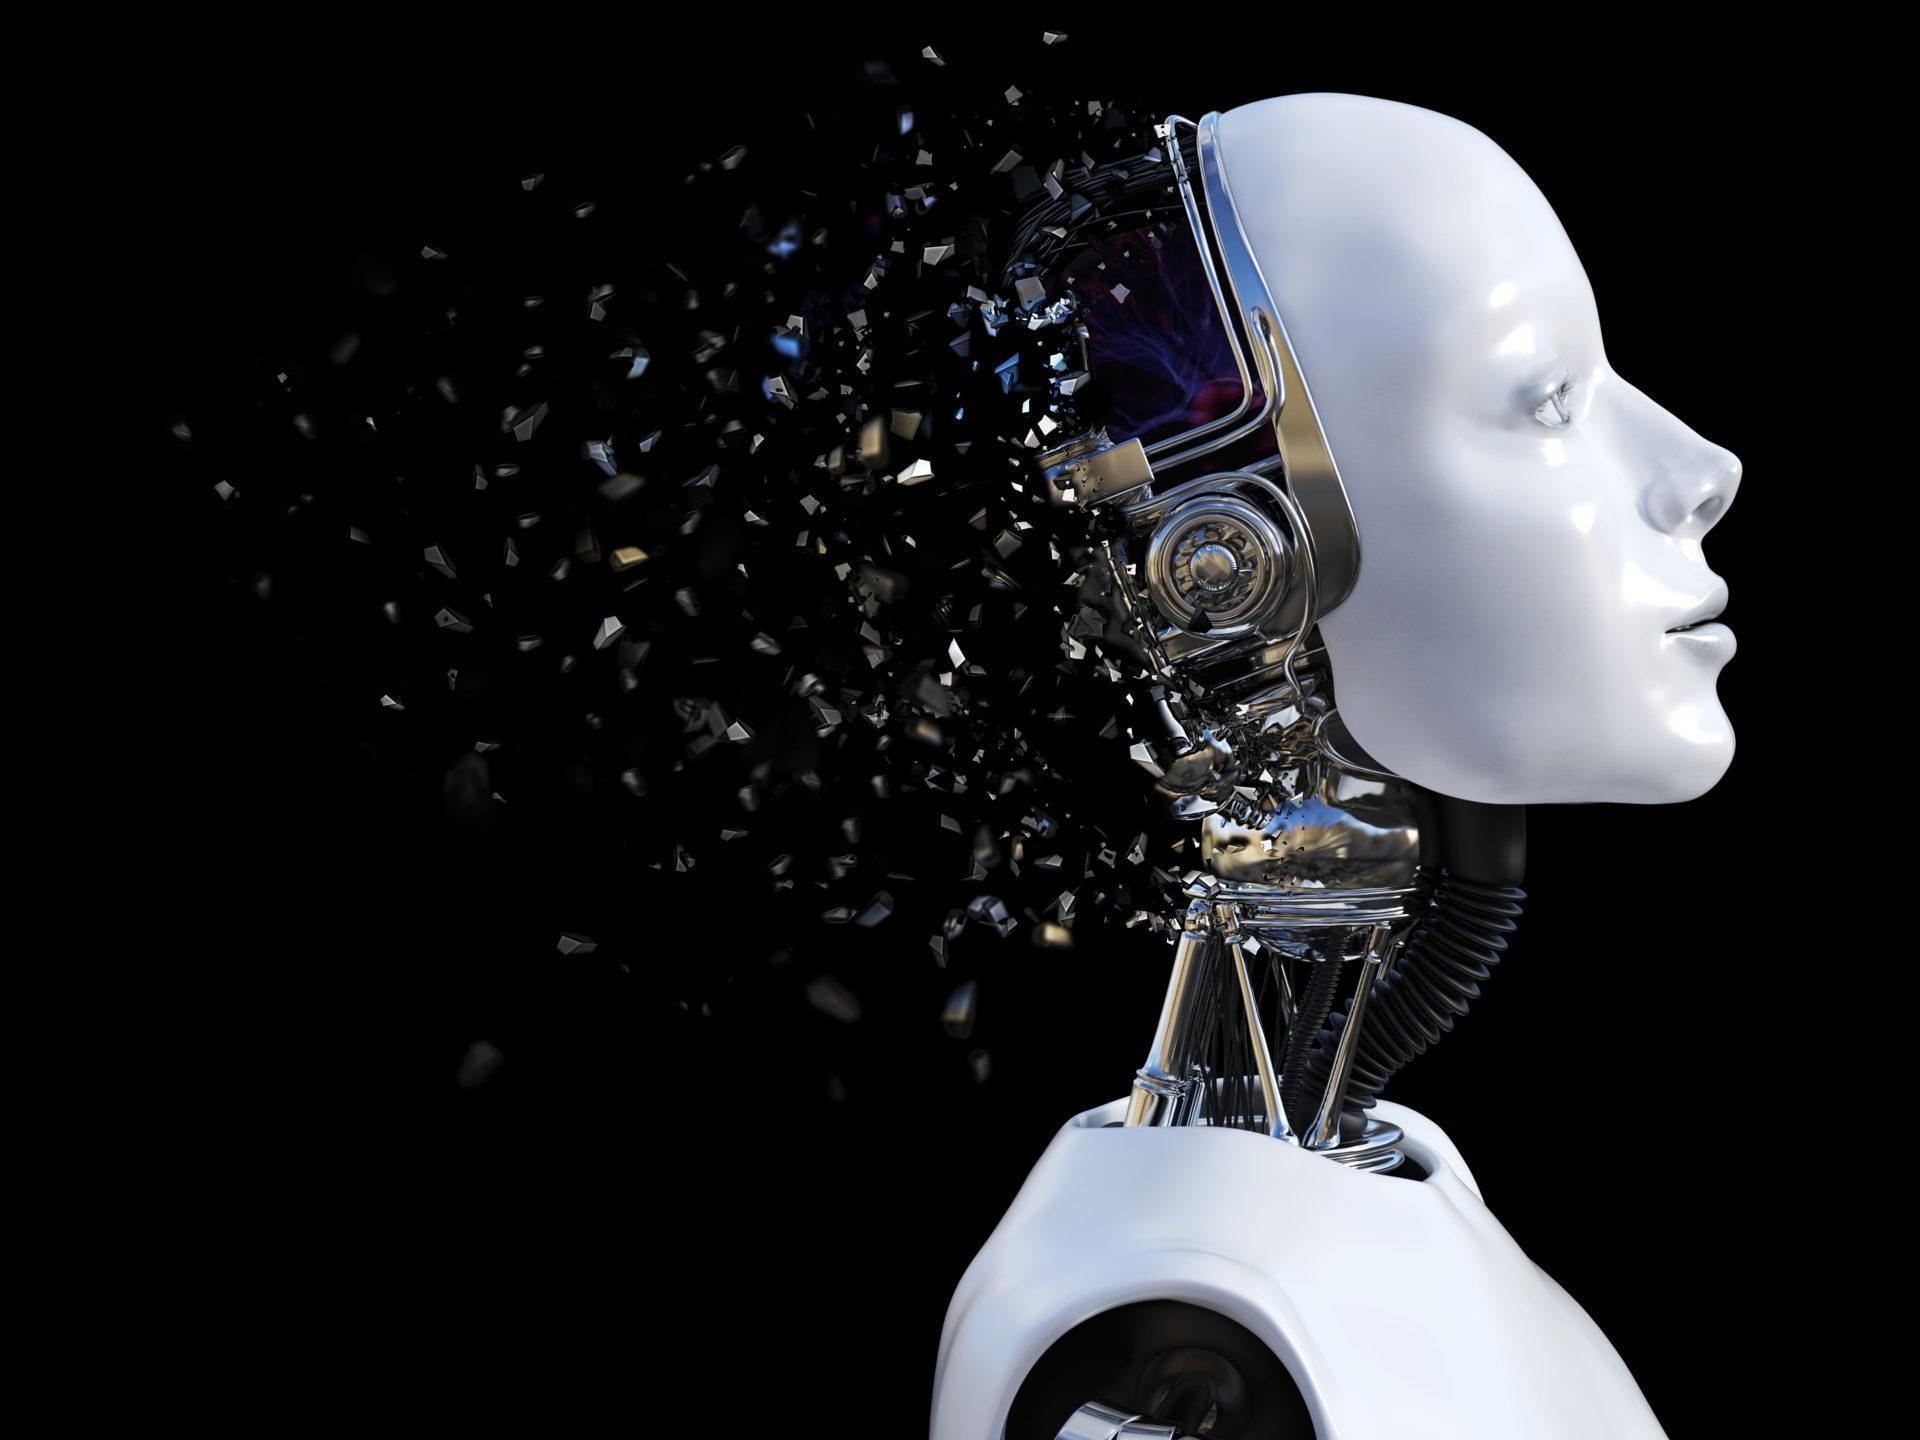 cercetatorii-de-la-oxford-lanseaza-un-nou-avertisment-robotii-vor-